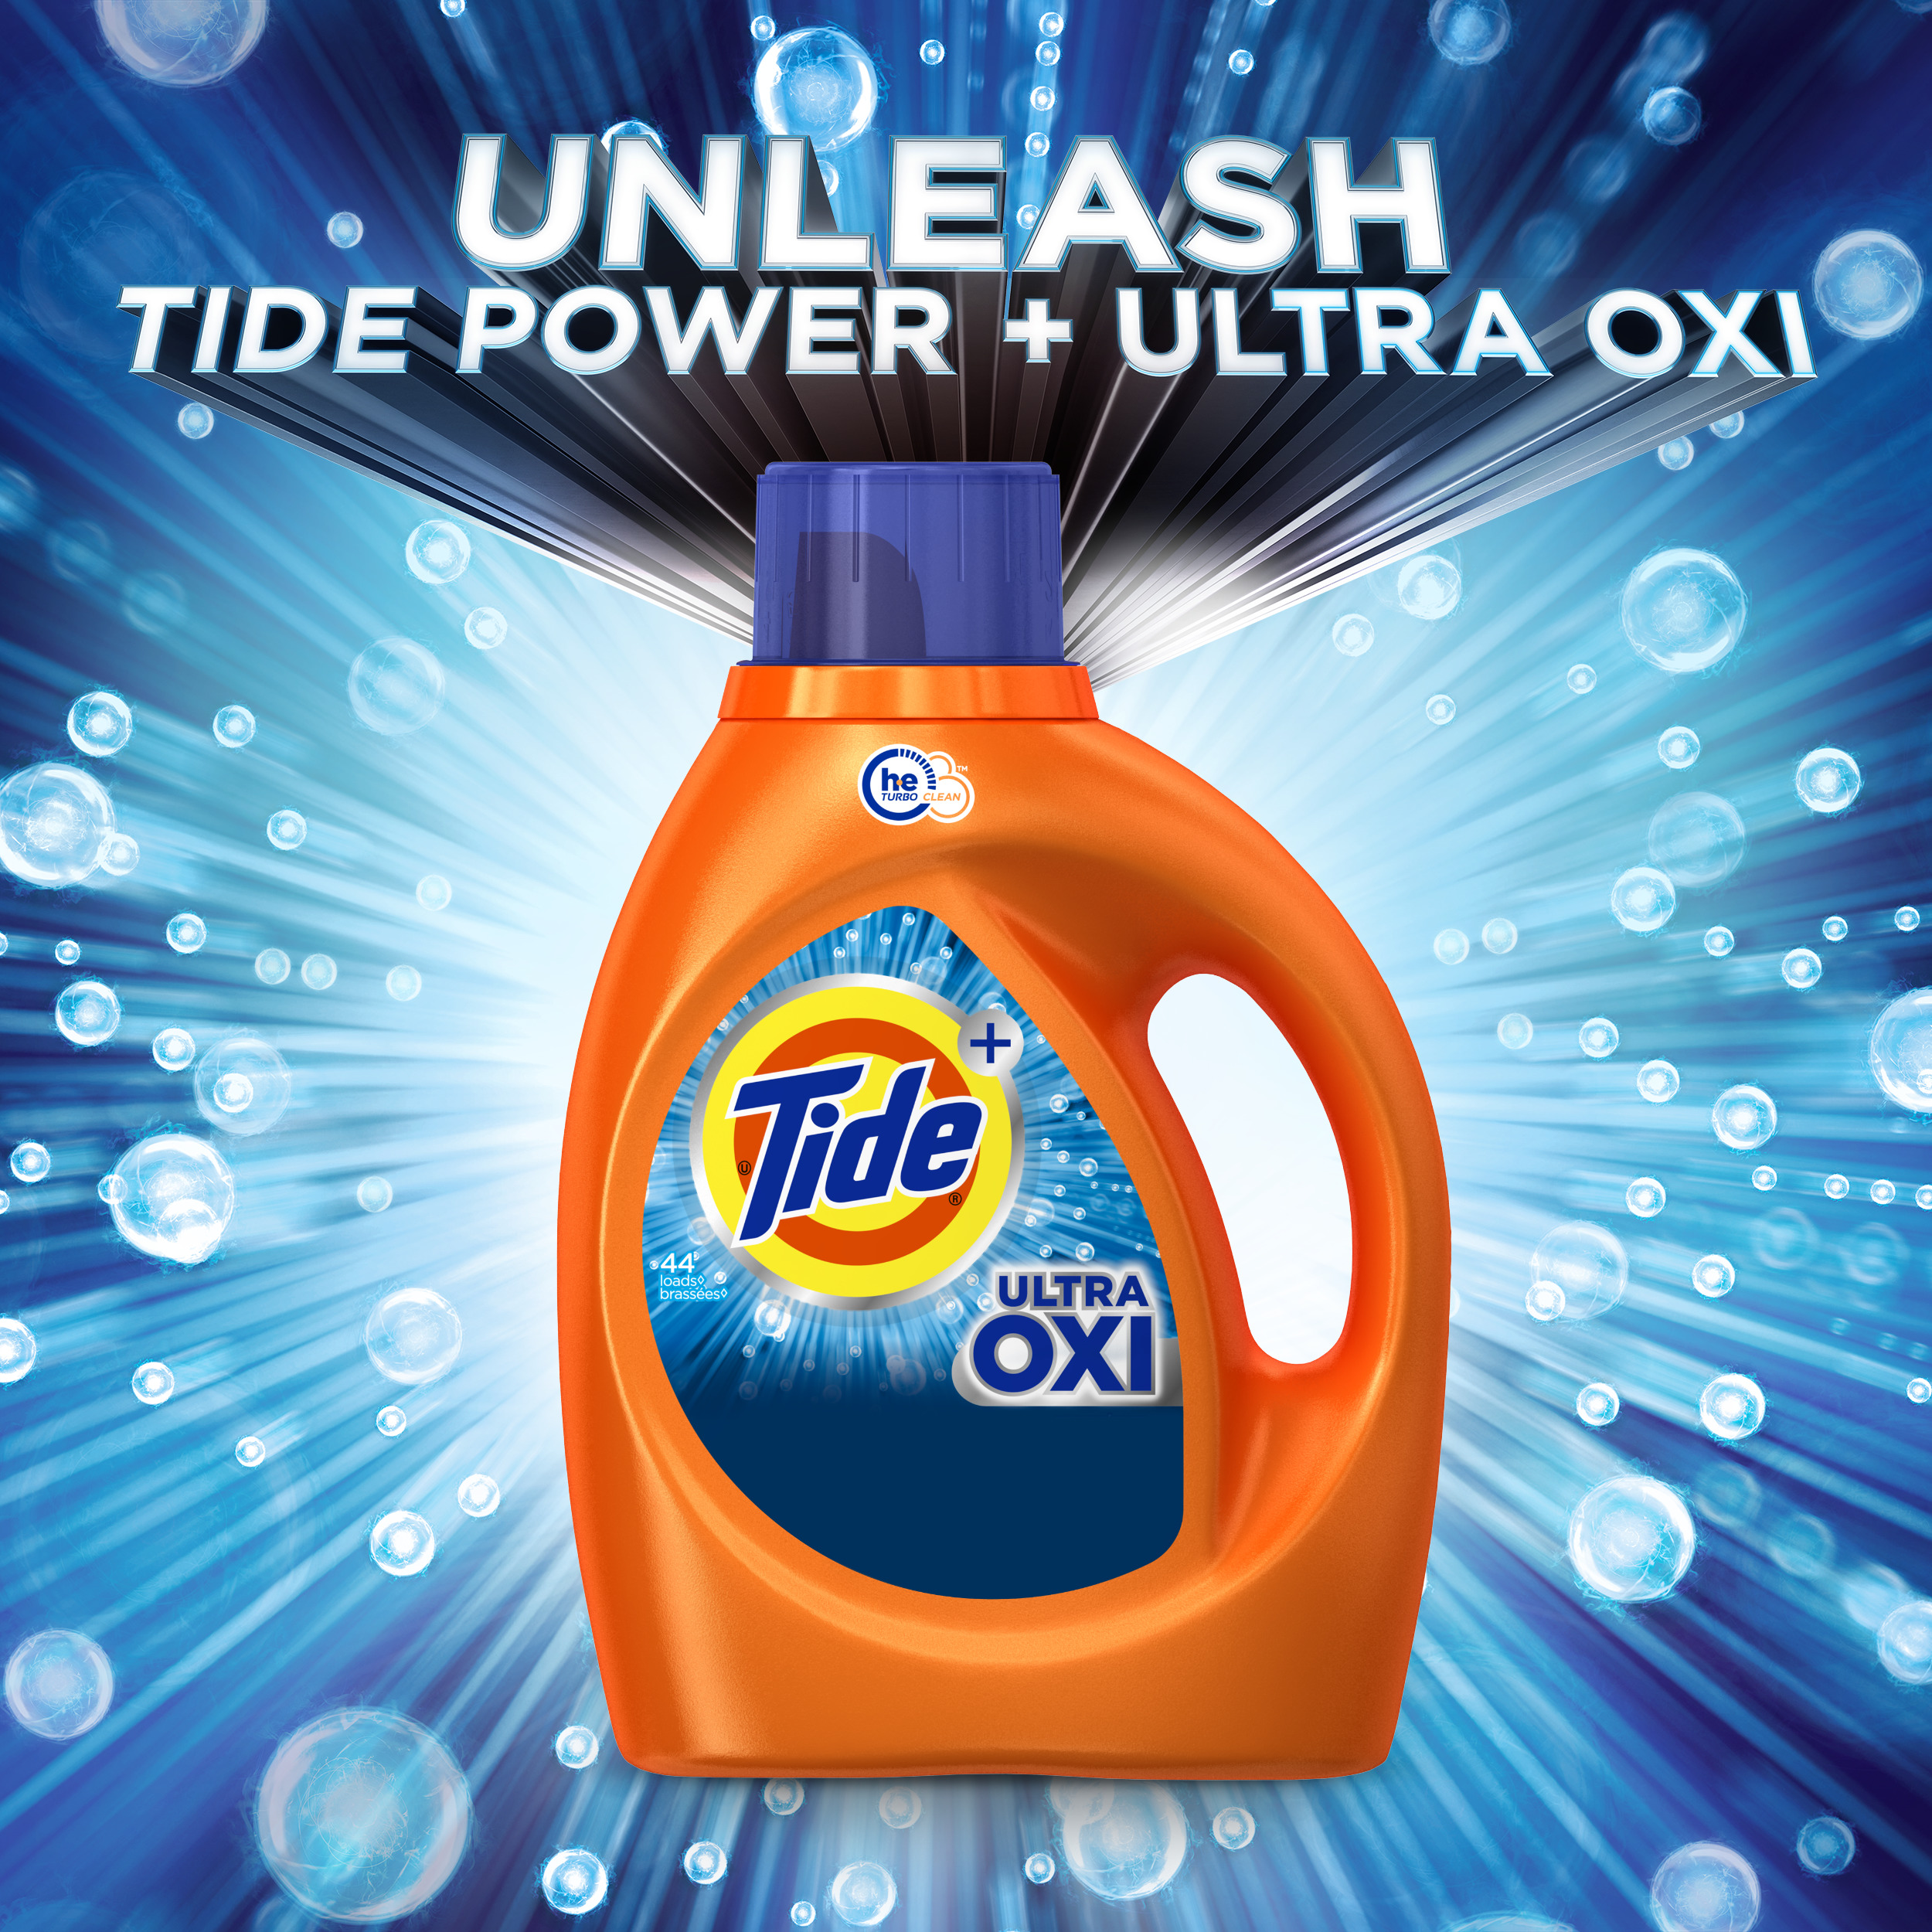 Tide Ultra Oxi Liquid Detergent, 59 Loads 92 fl oz - Walmart com